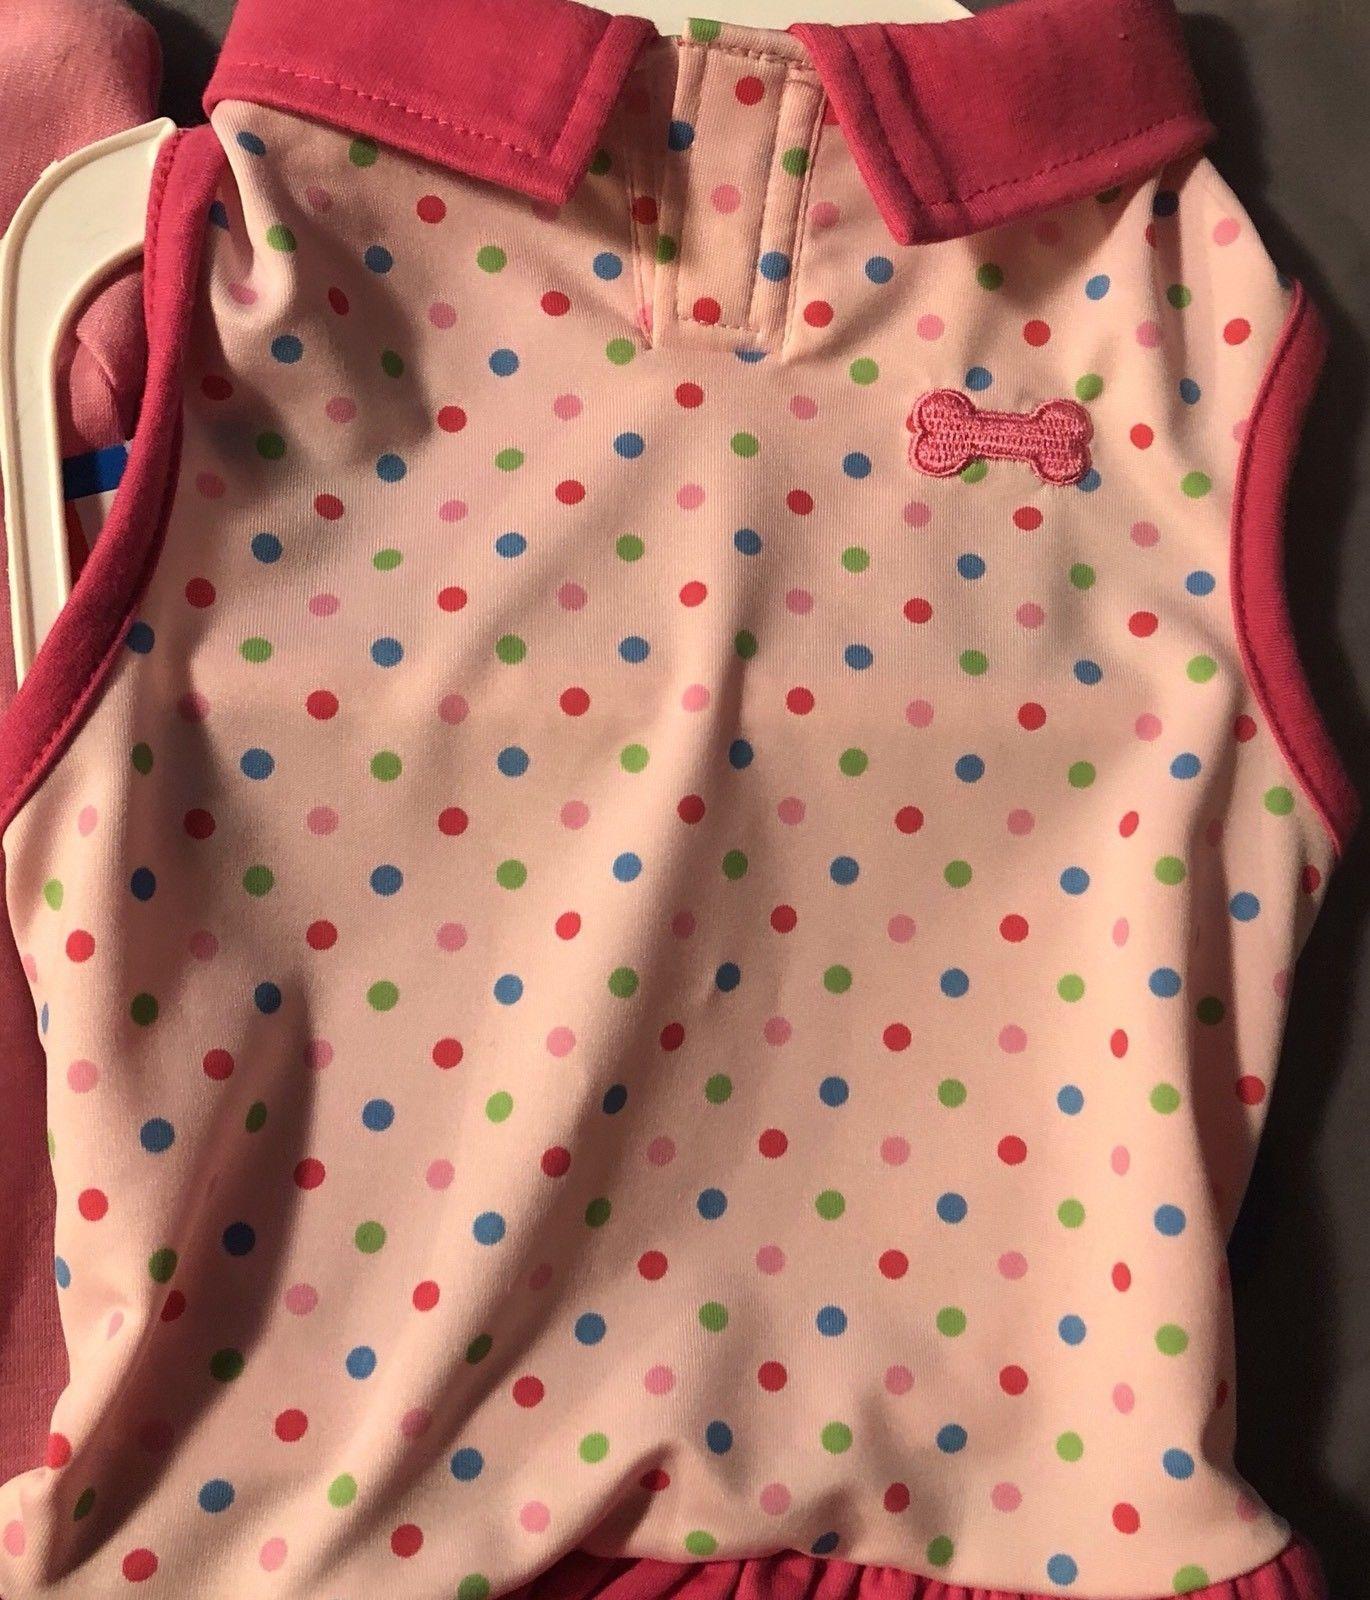 Dog Clothing Lot of 3 Medium Shirt Tee Sweater Dress Boy Girl Unisex